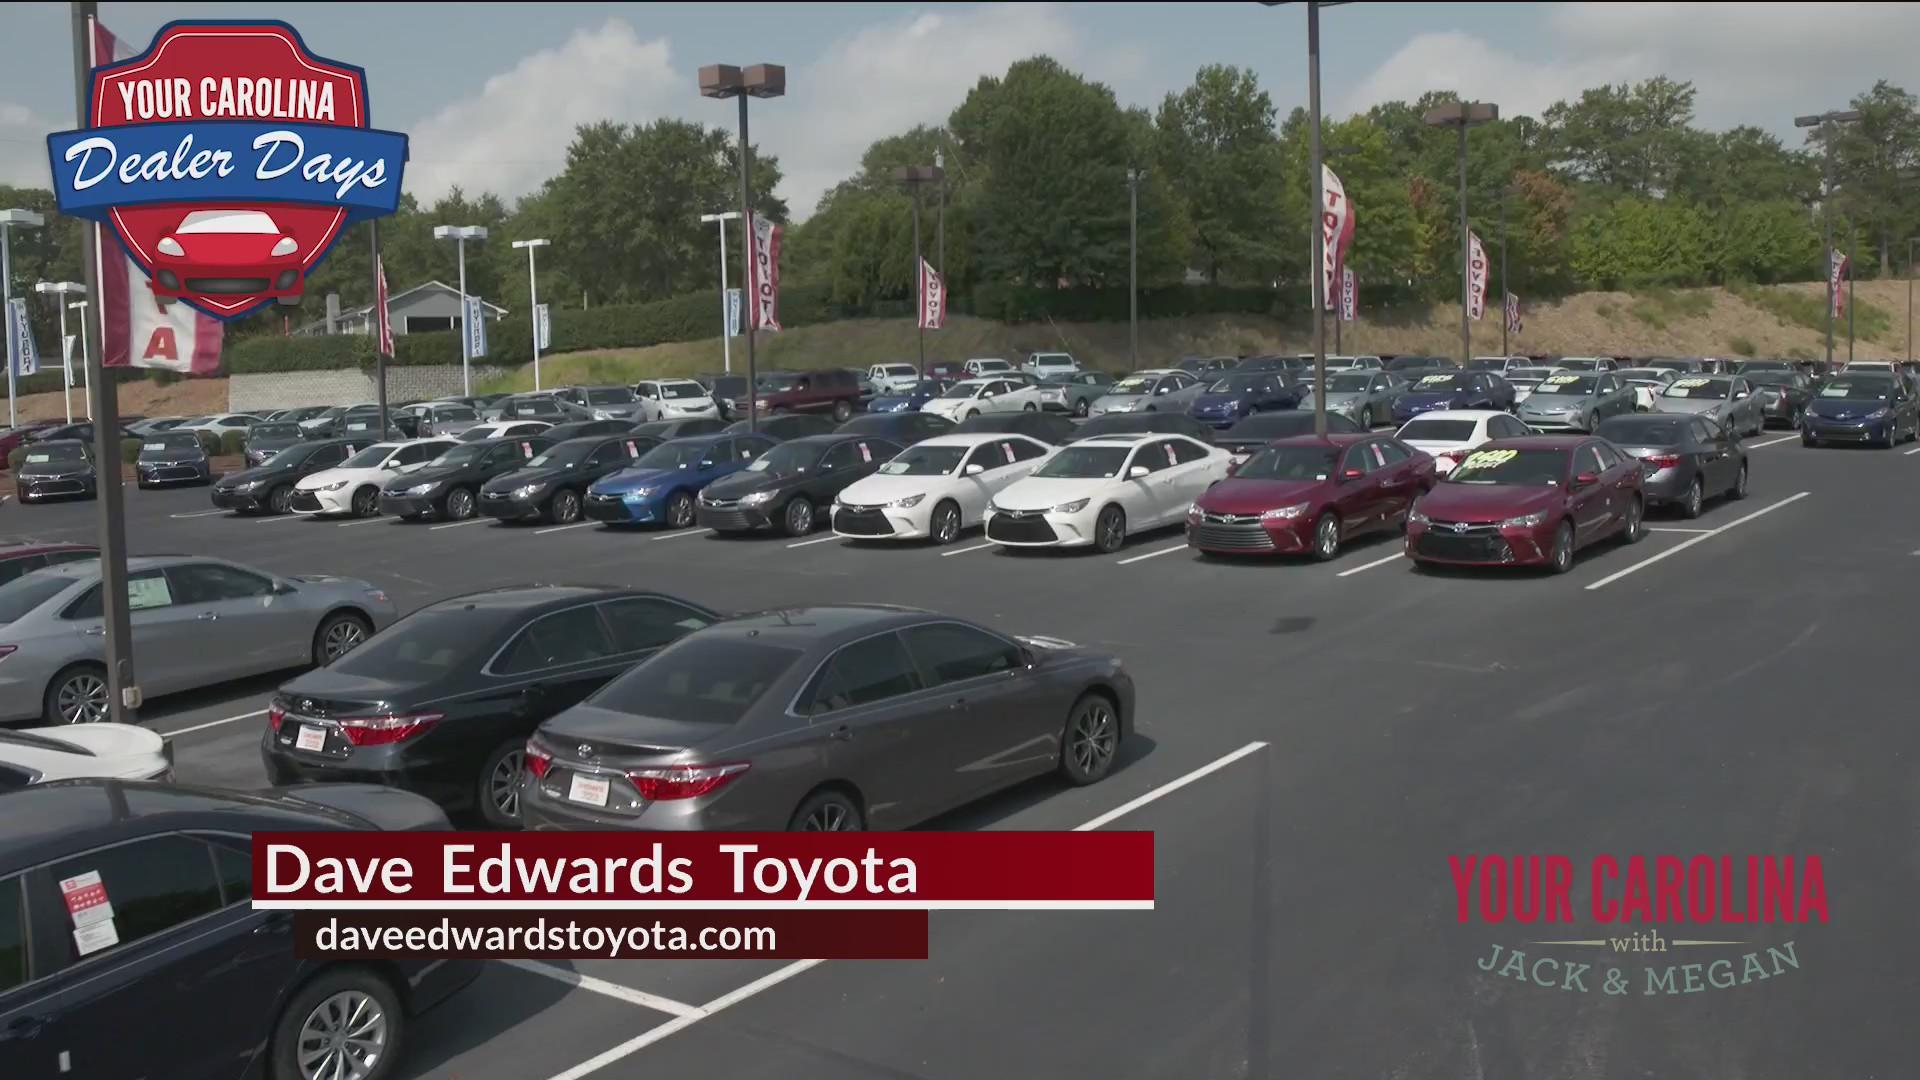 Dealer Days - Dave Edwards Toyota